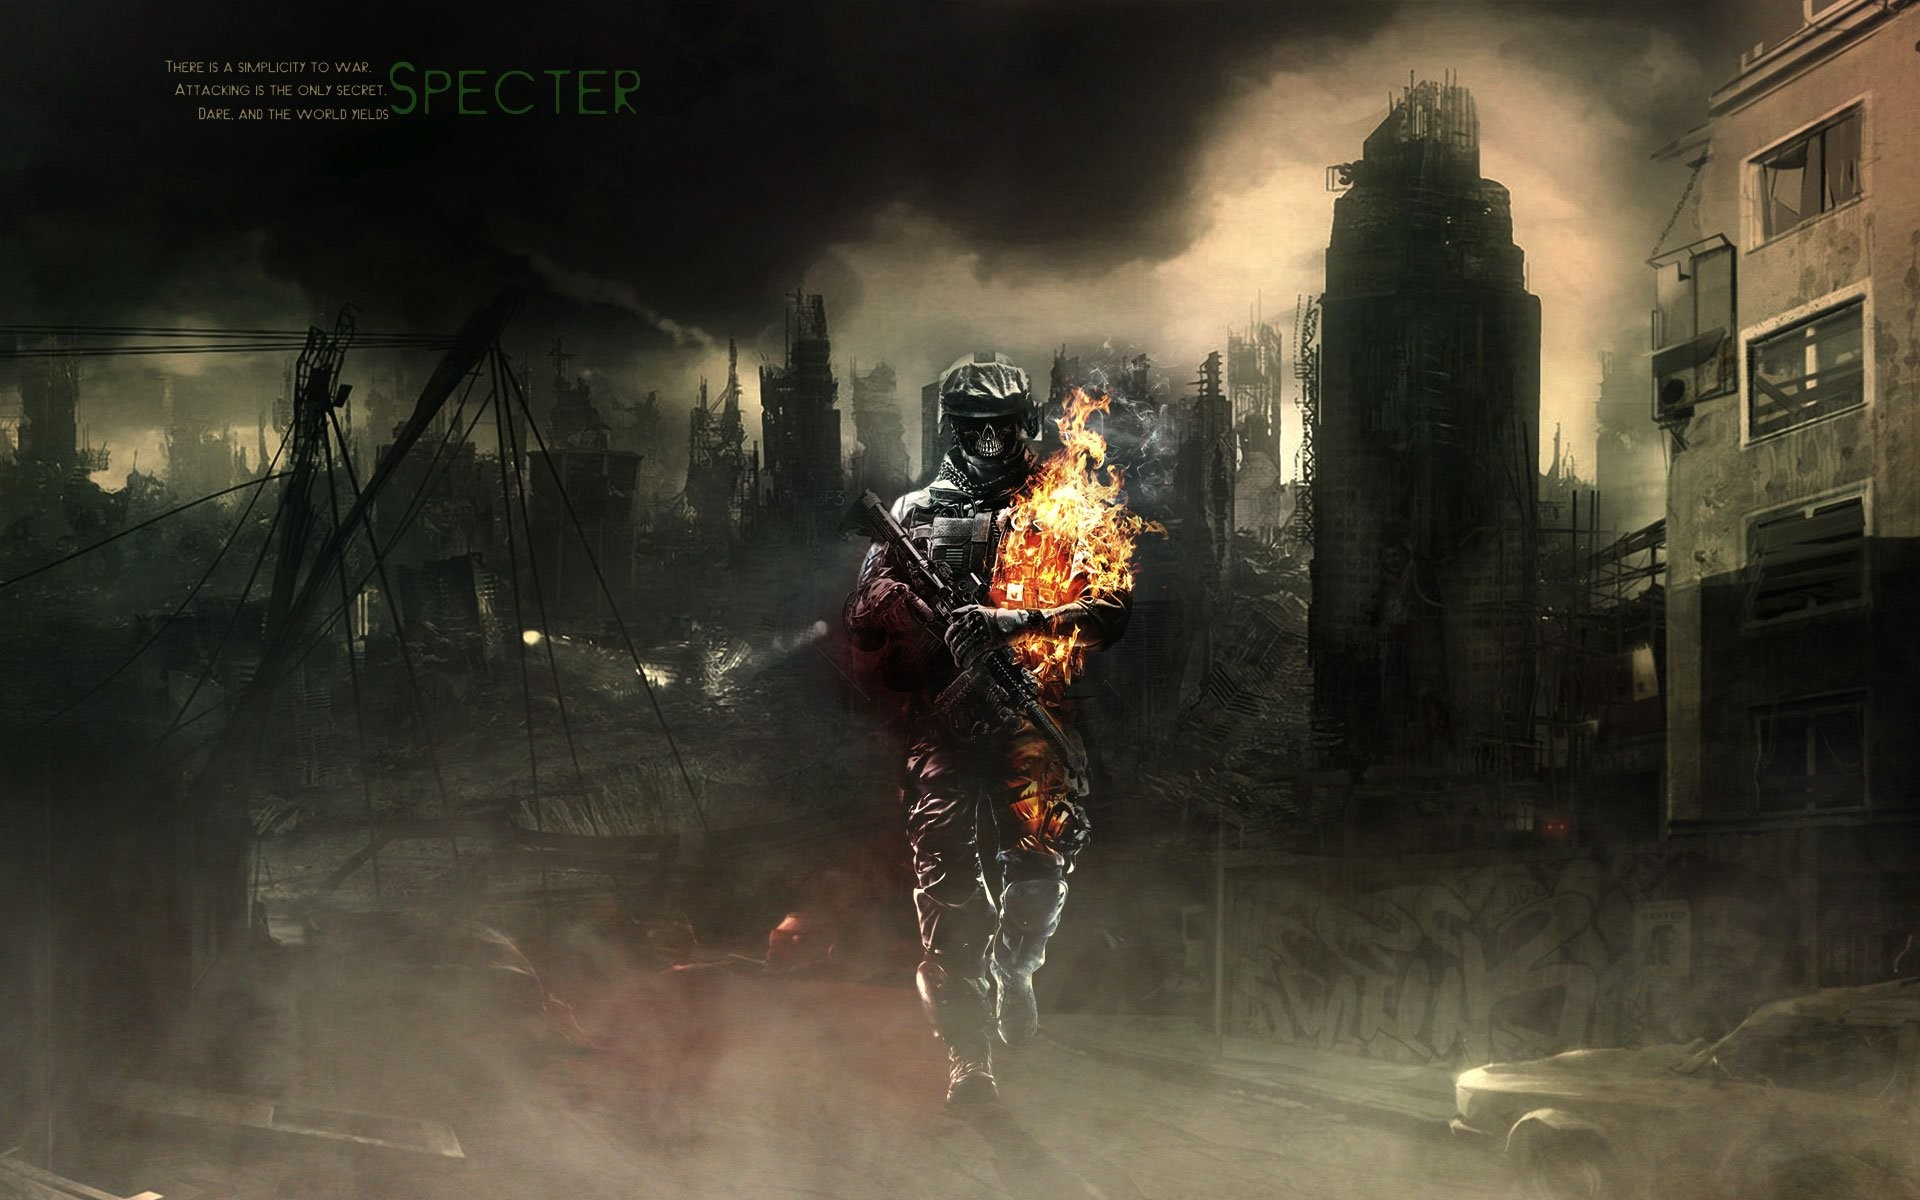 Destroyed City Background 62 Images